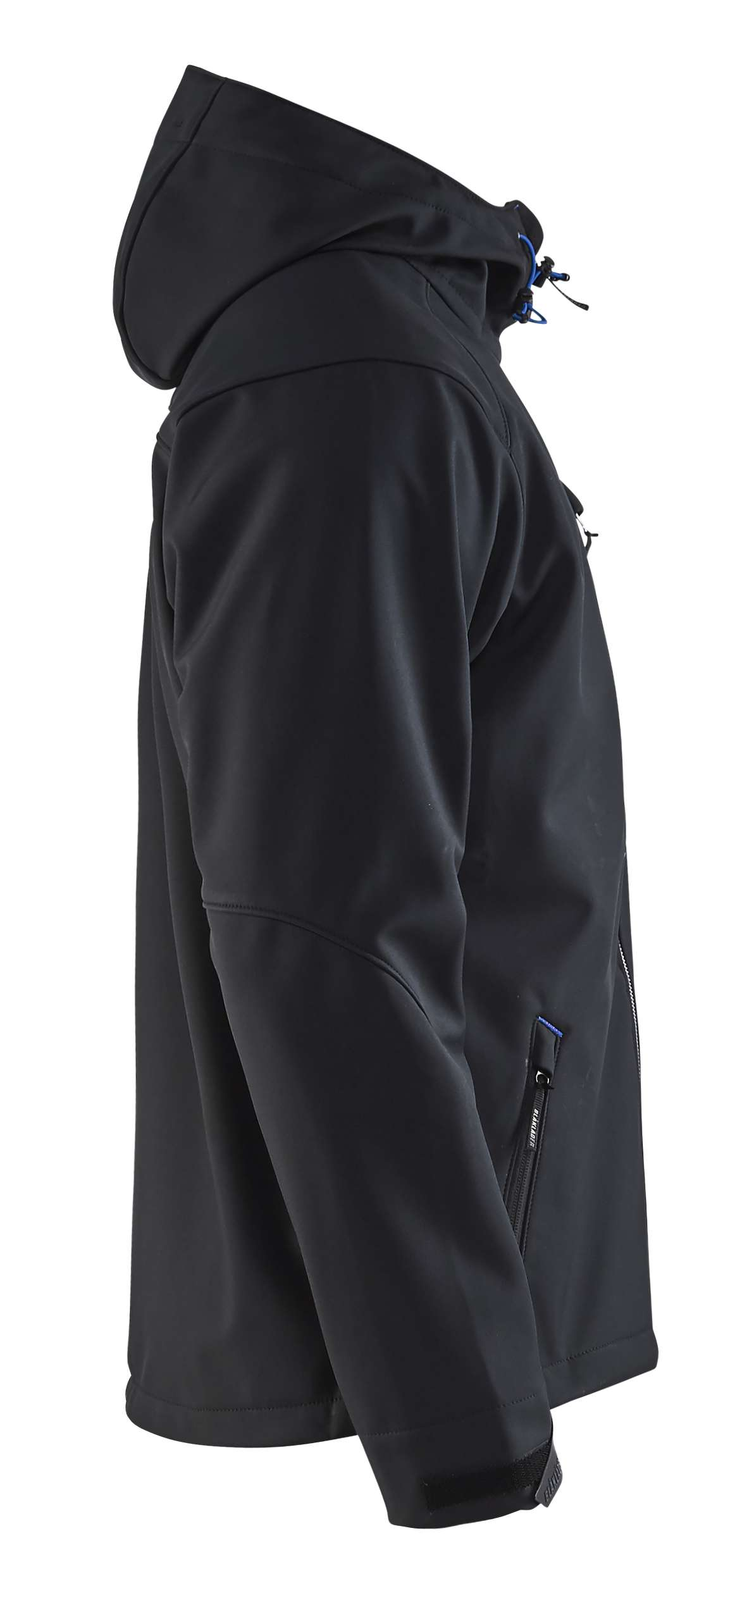 Blaklader Softshell jacks 49492517 zwart-korenblauw(9985)